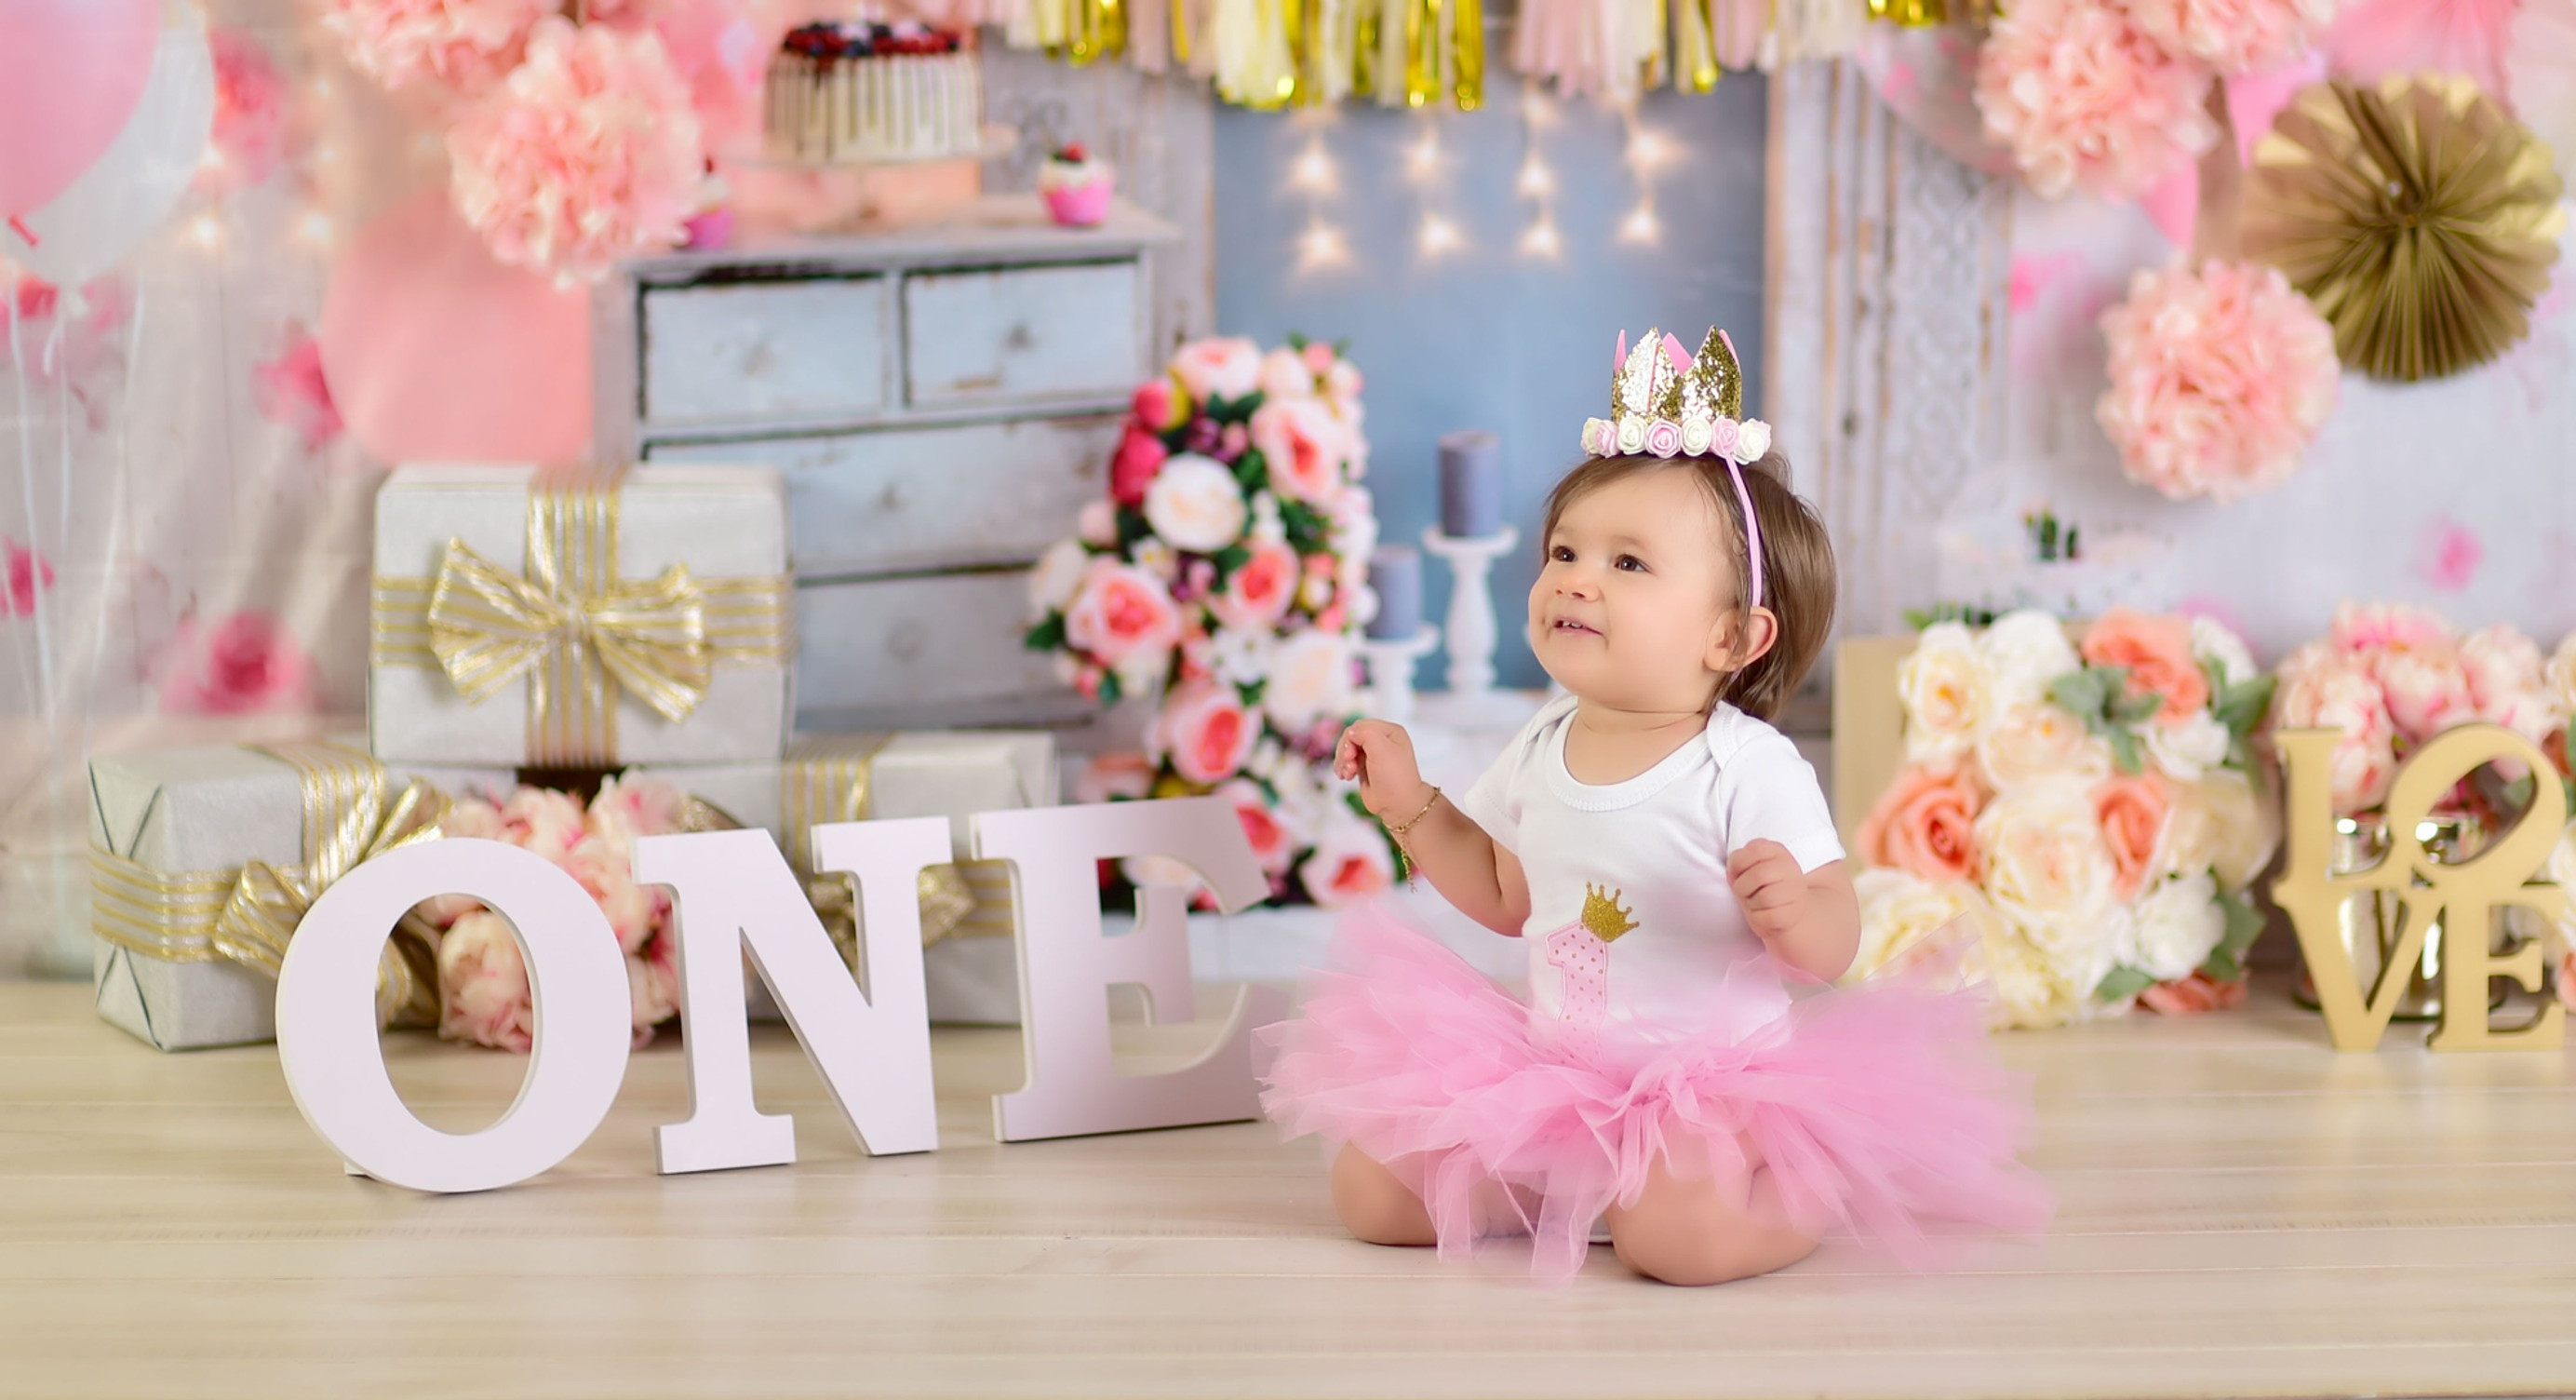 Family & Birthday Photography - Digital